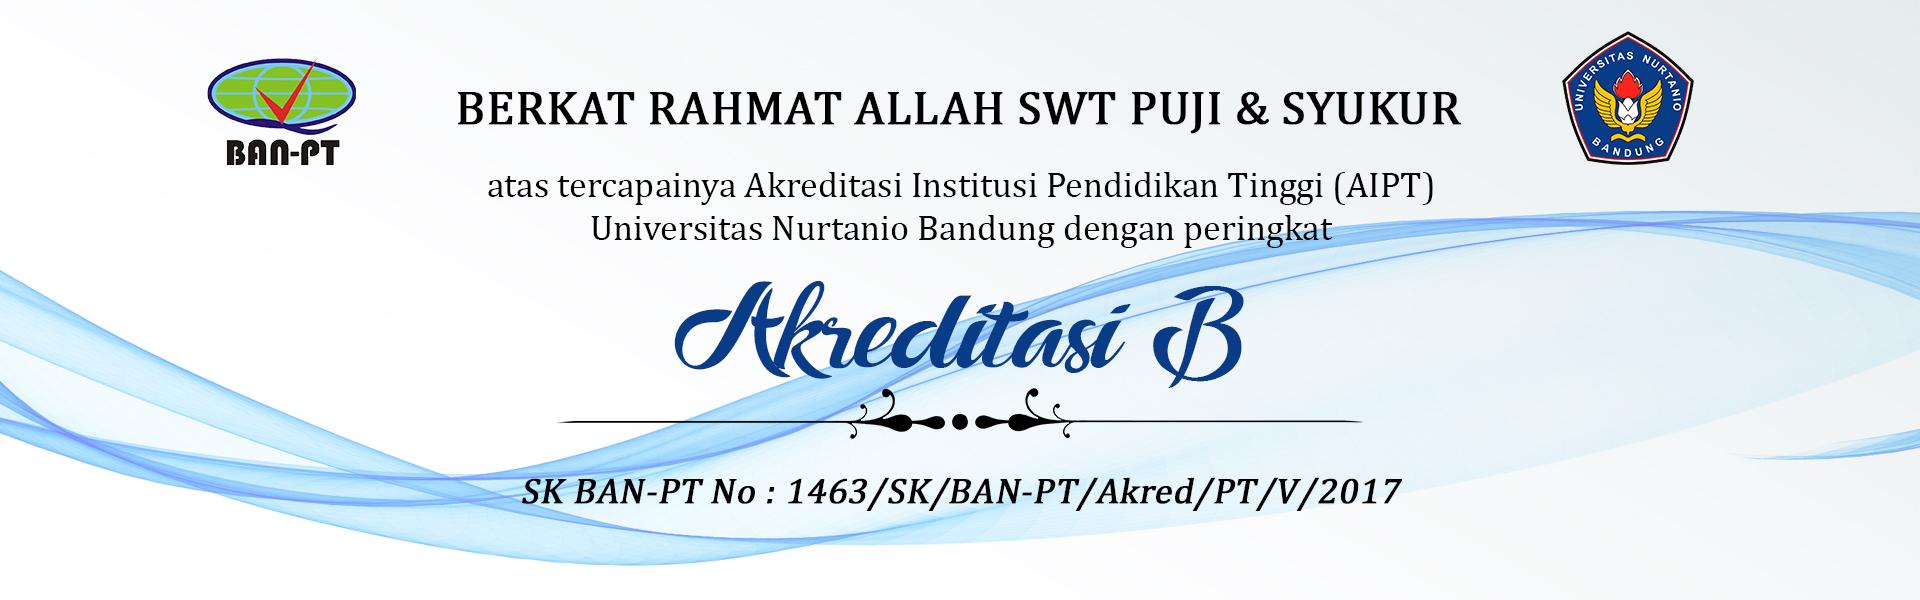 akreditasi-b